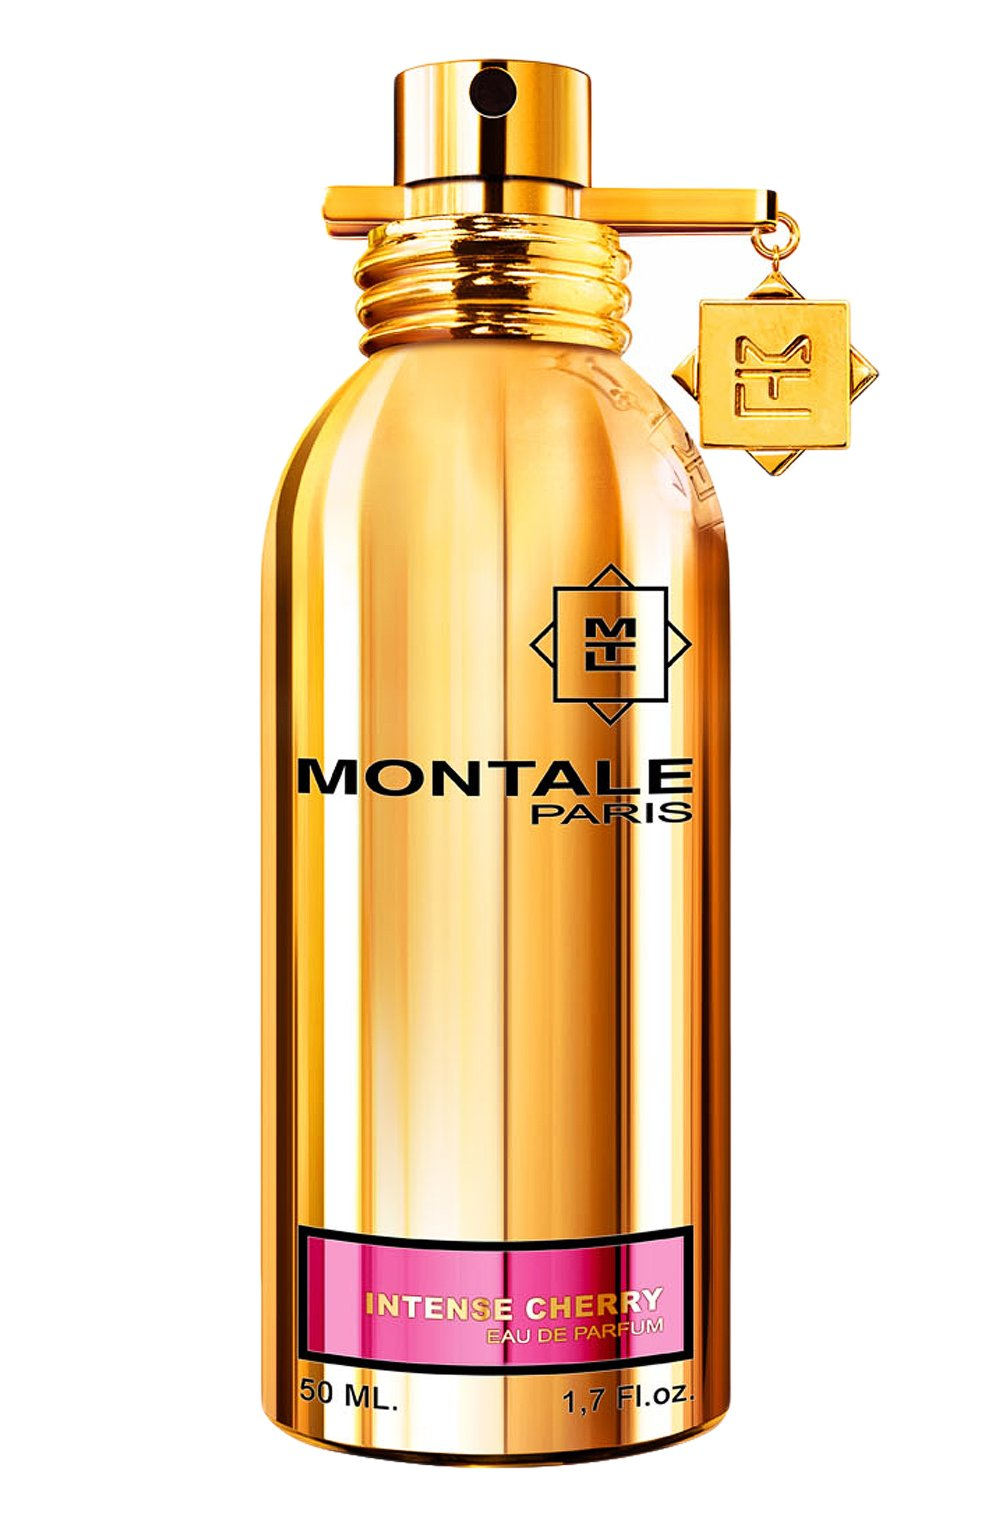 Парфюмерная вода intense cherry MONTALE бесцветного цвета, арт. 3760260454490 | Фото 1 (Unisex: Unisex; Статус проверки: Проверена категория; Ограничения доставки: flammable)